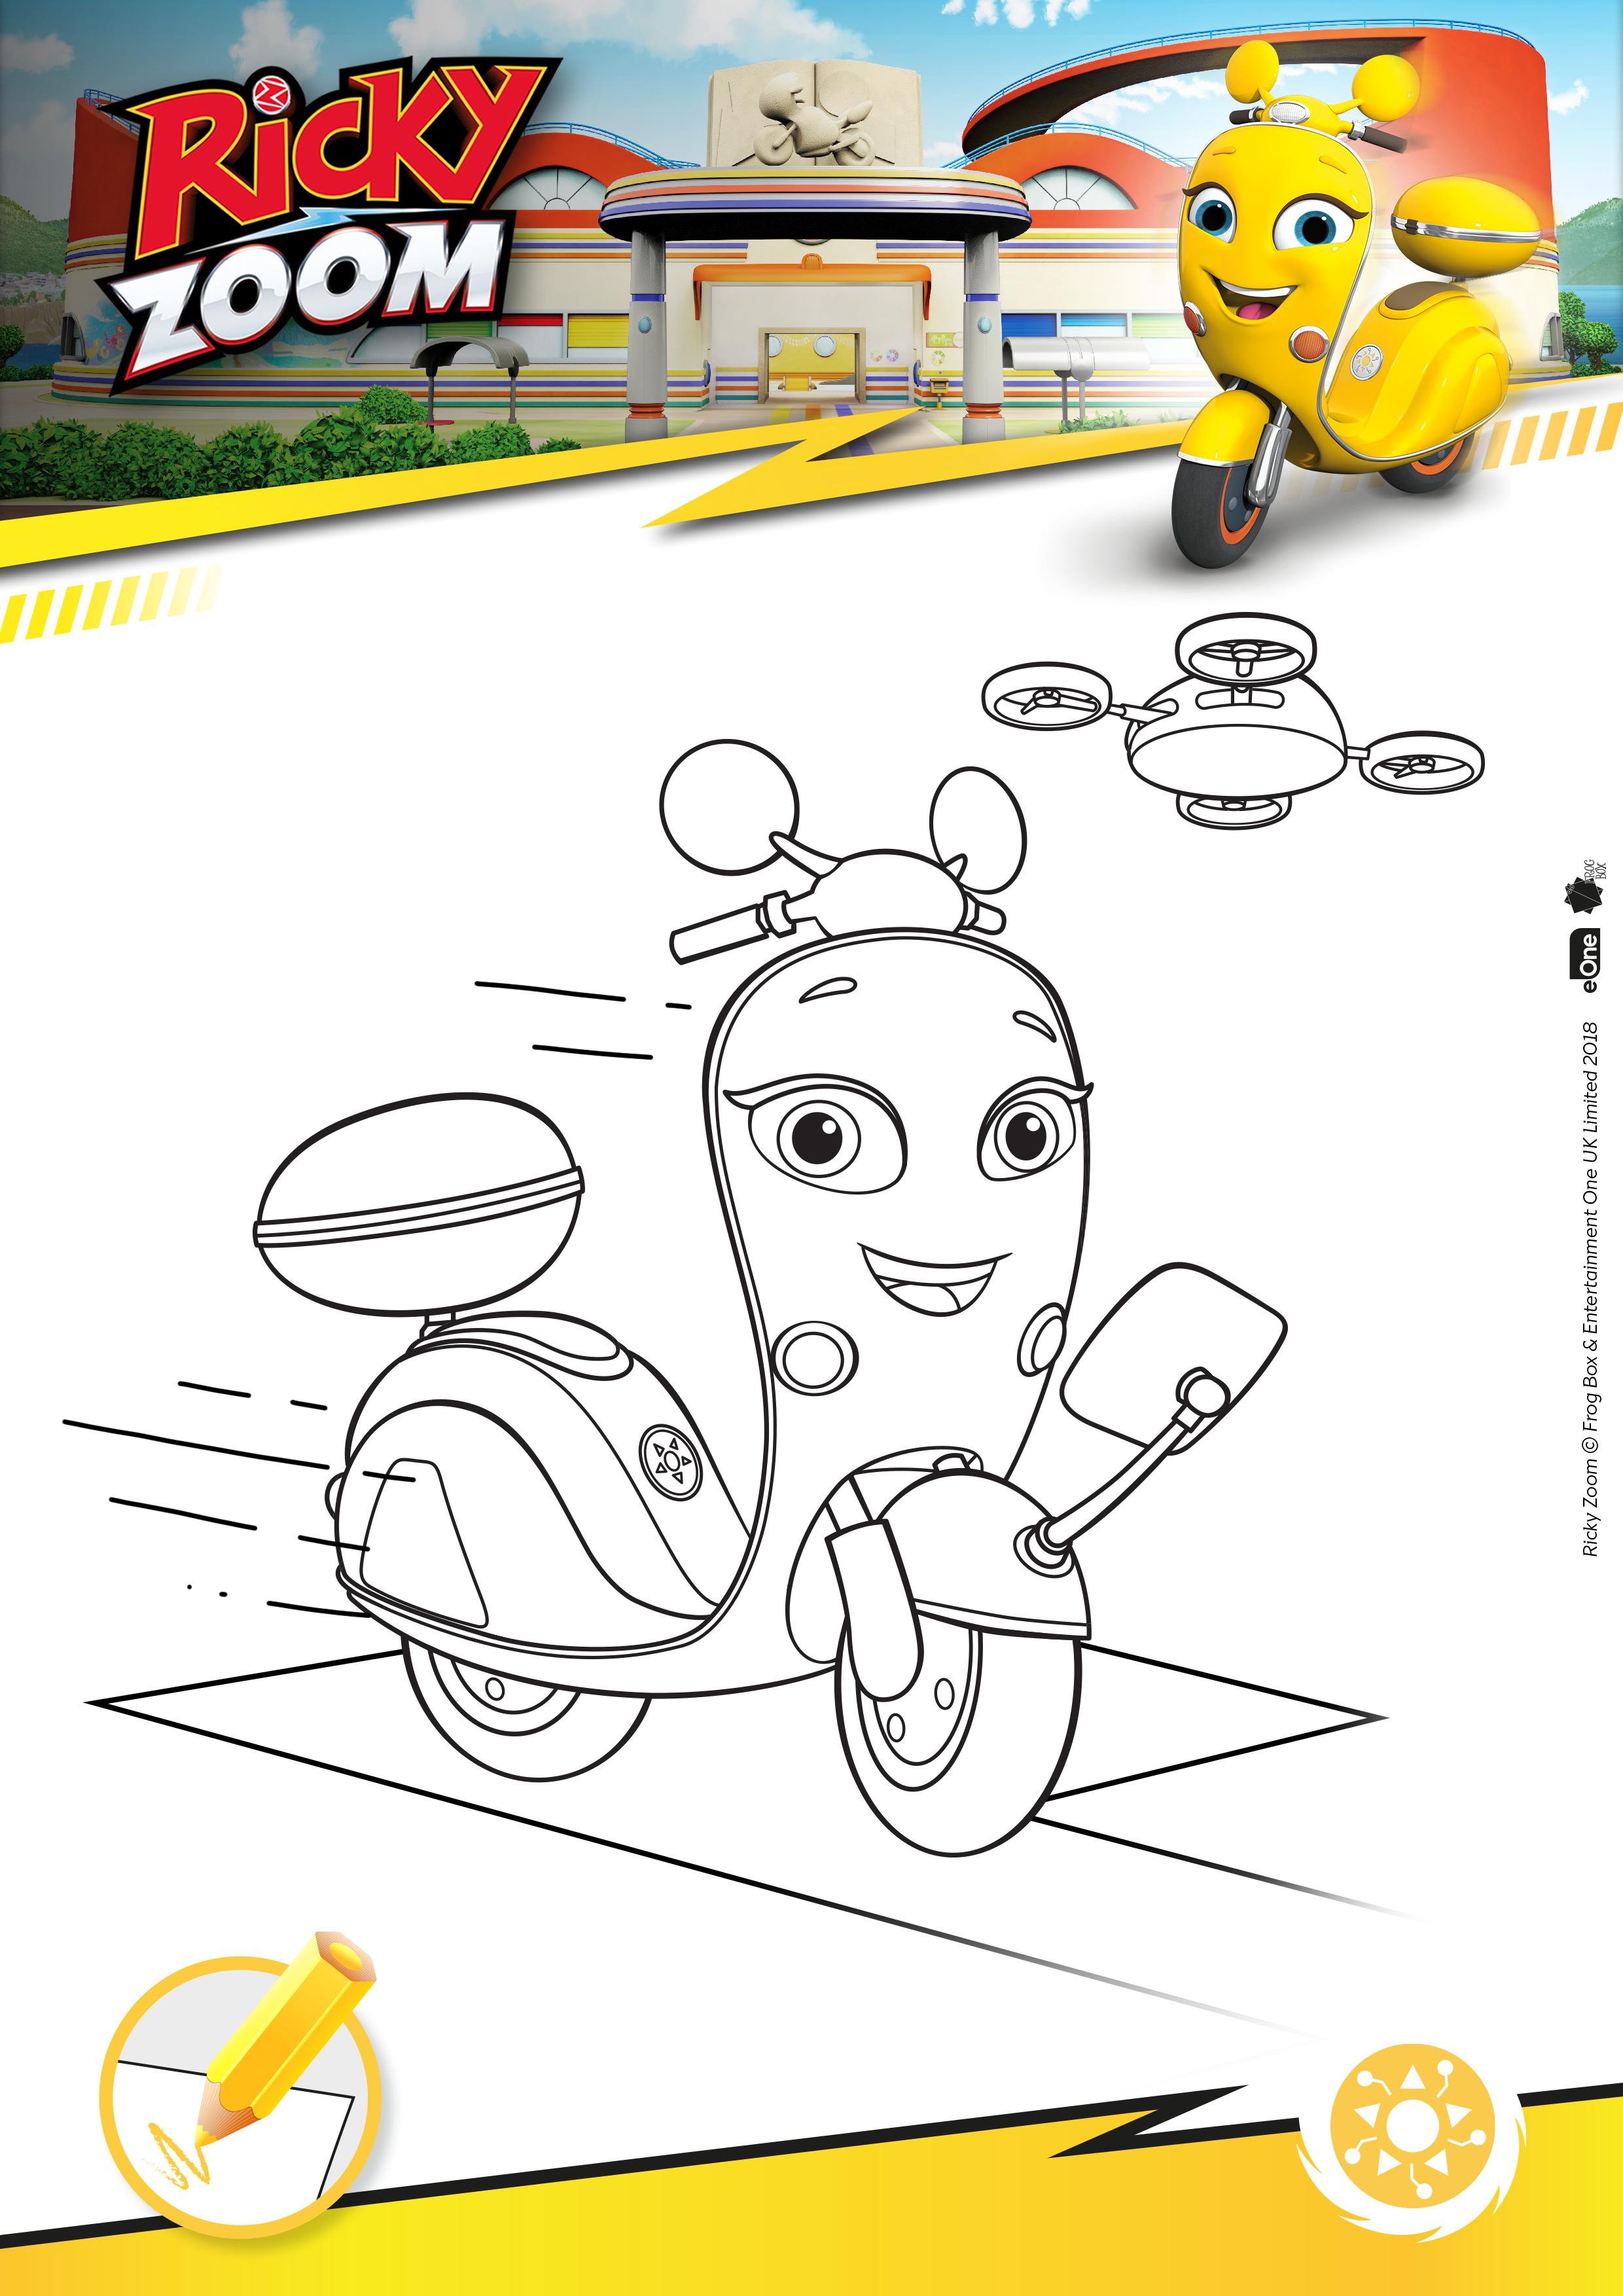 Imagens De Colorir Ricky Zoom In 2020 Discovery Kids Kids Cartoon